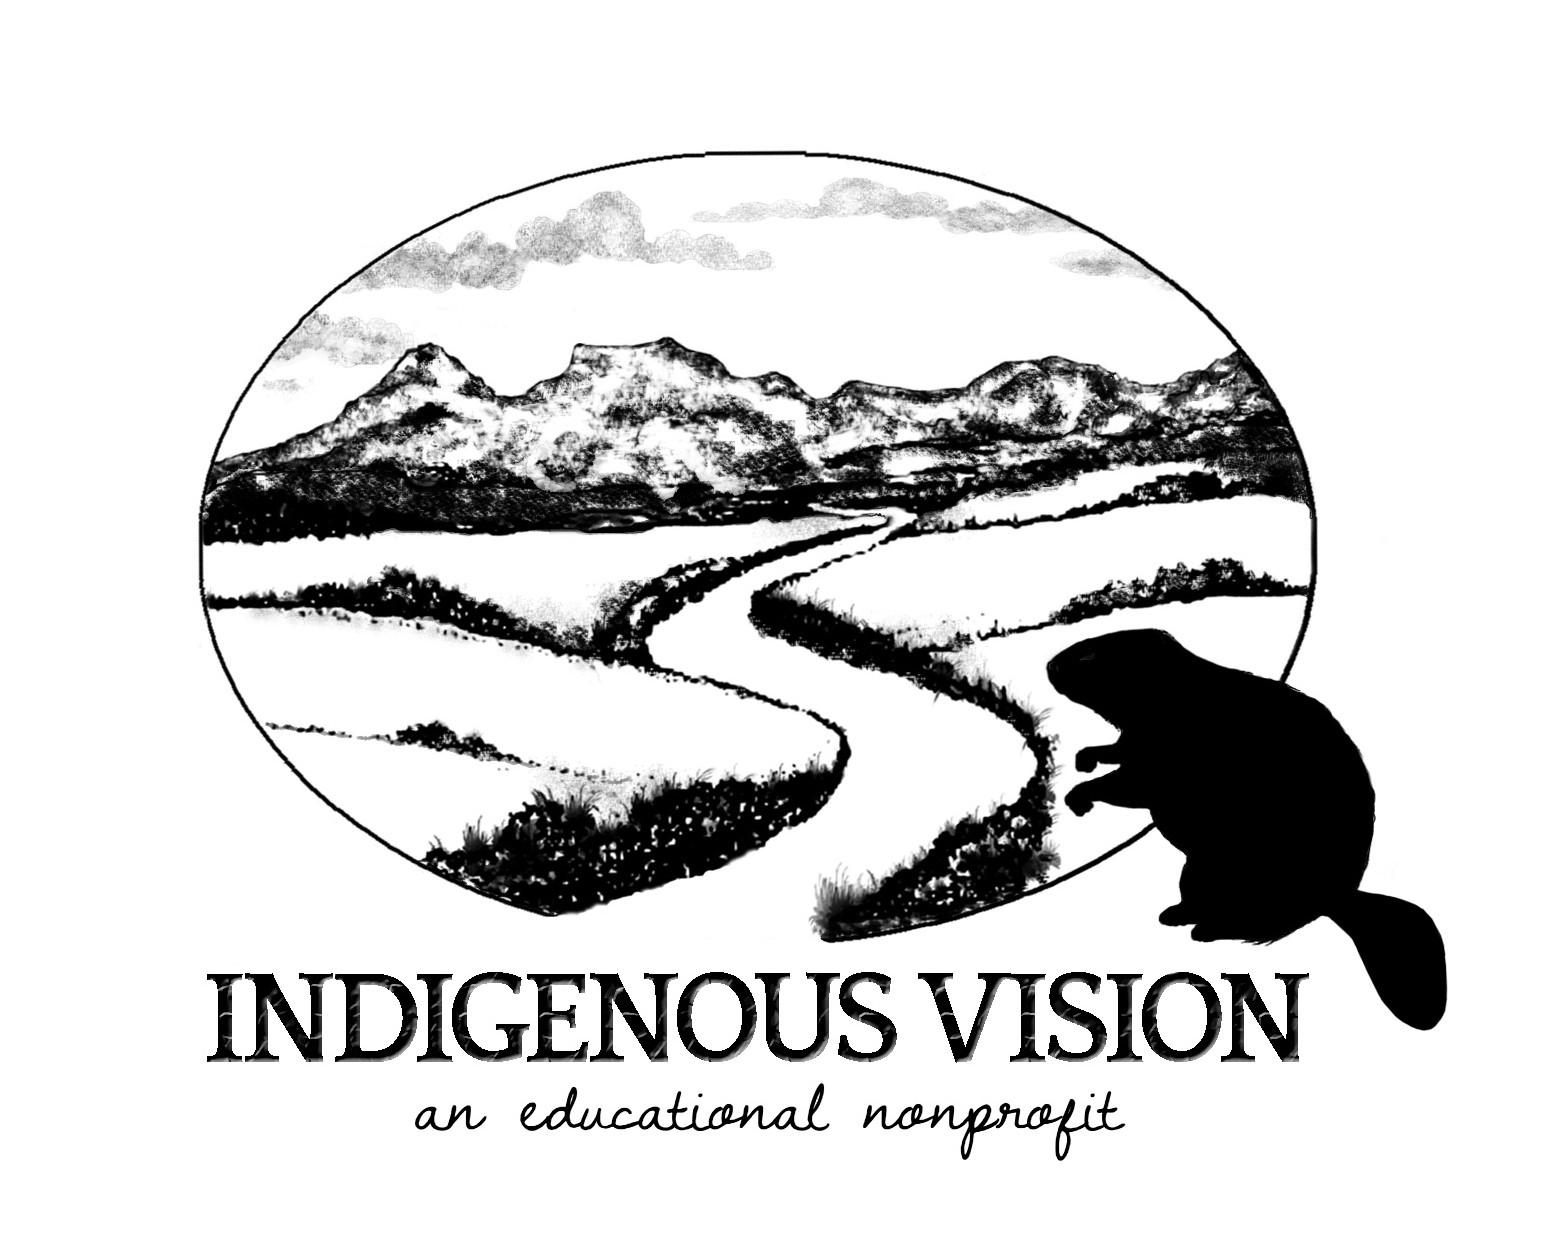 Indigenous Vision